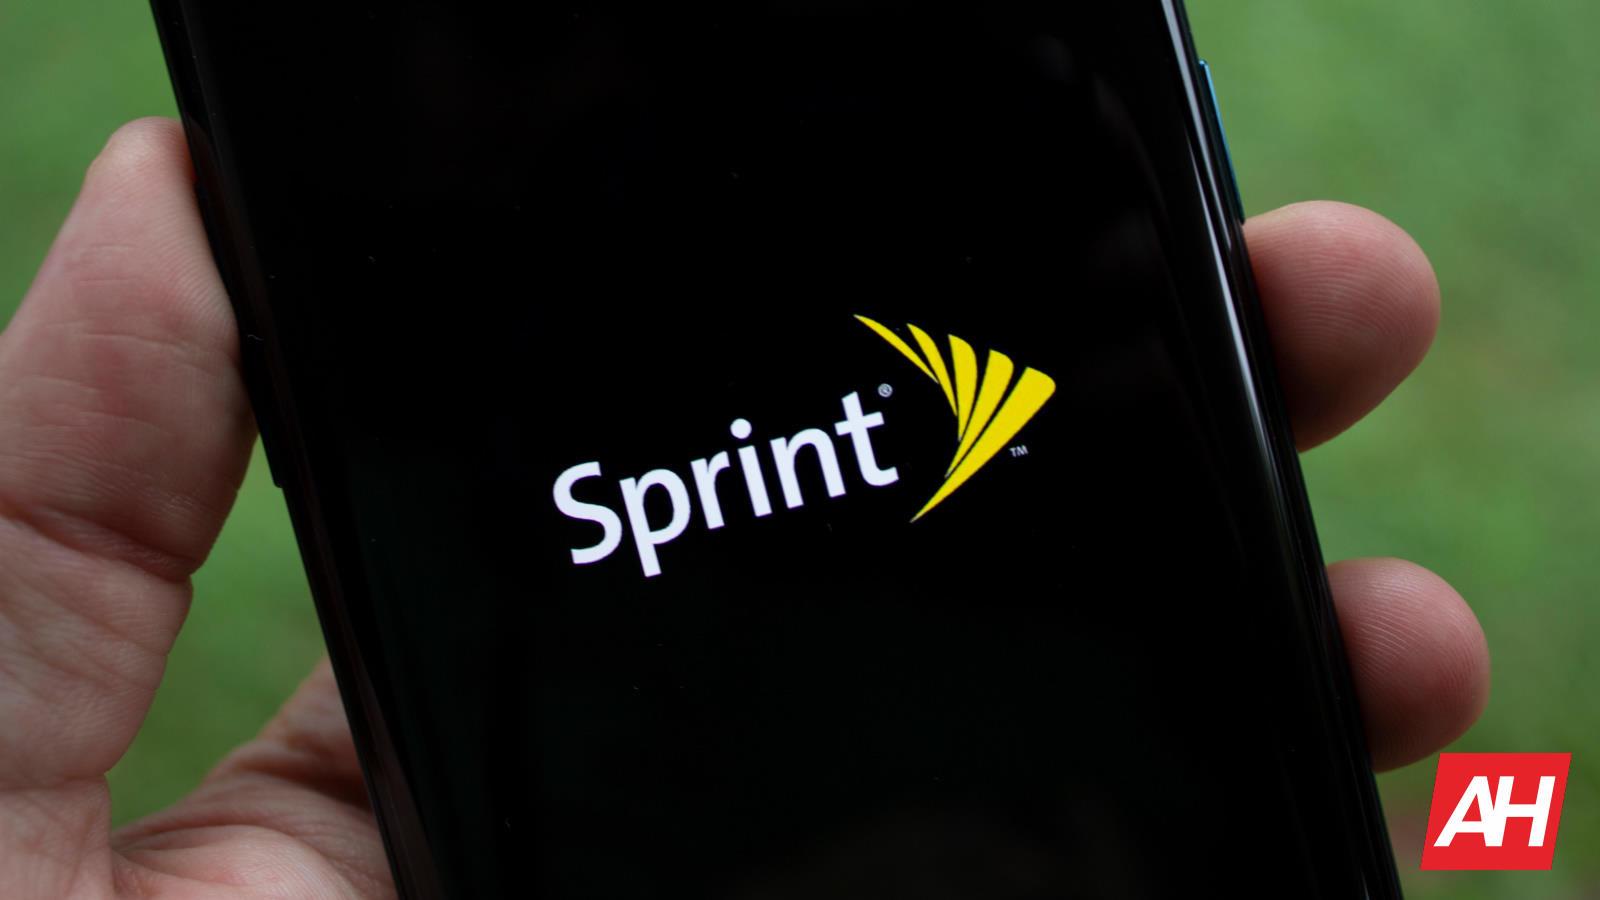 Sprint Hints At 5G-Ready Samsung Galaxy Note 10 Coming This Summer